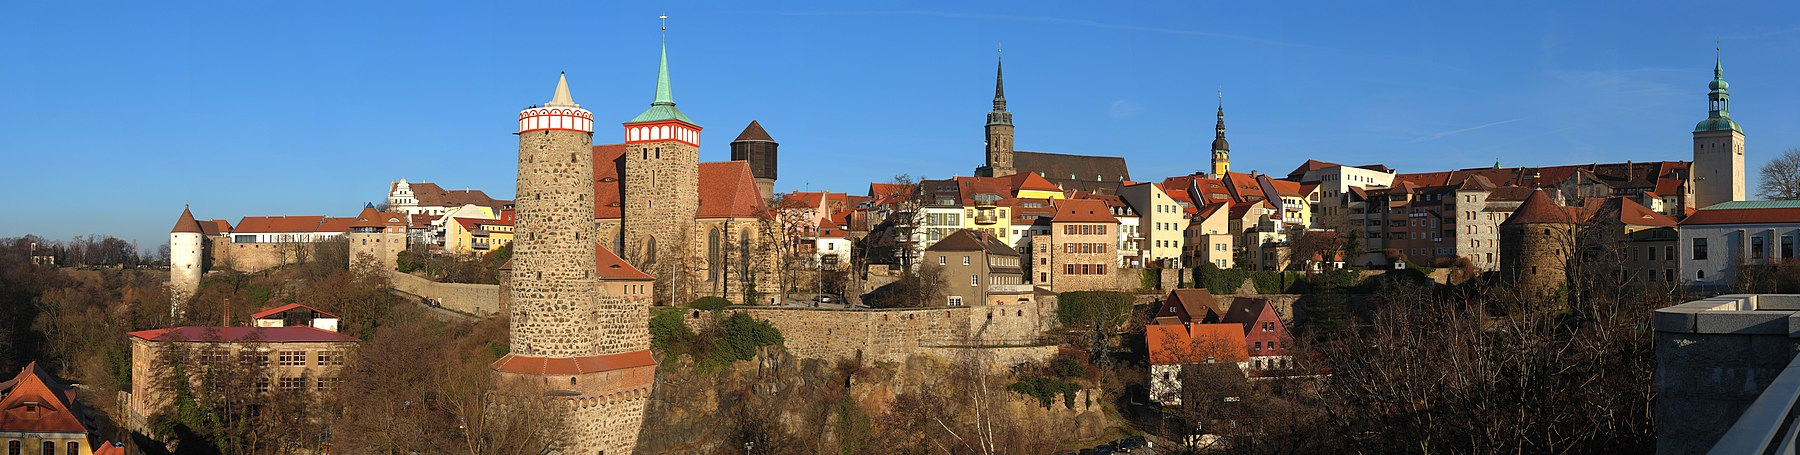 Bautzen-pano-day-gp.jpg